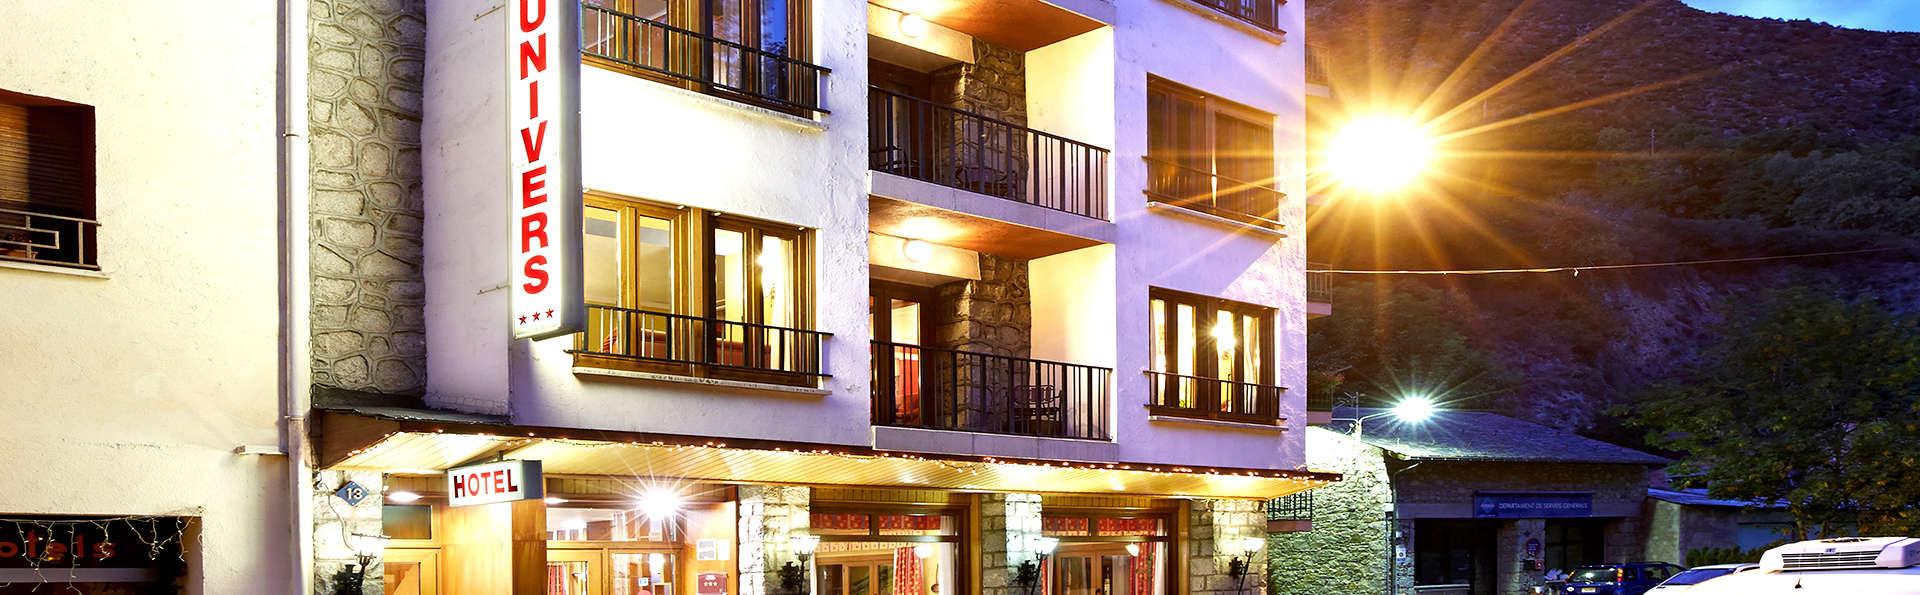 Hotel Univers - Edit_Front2.jpg